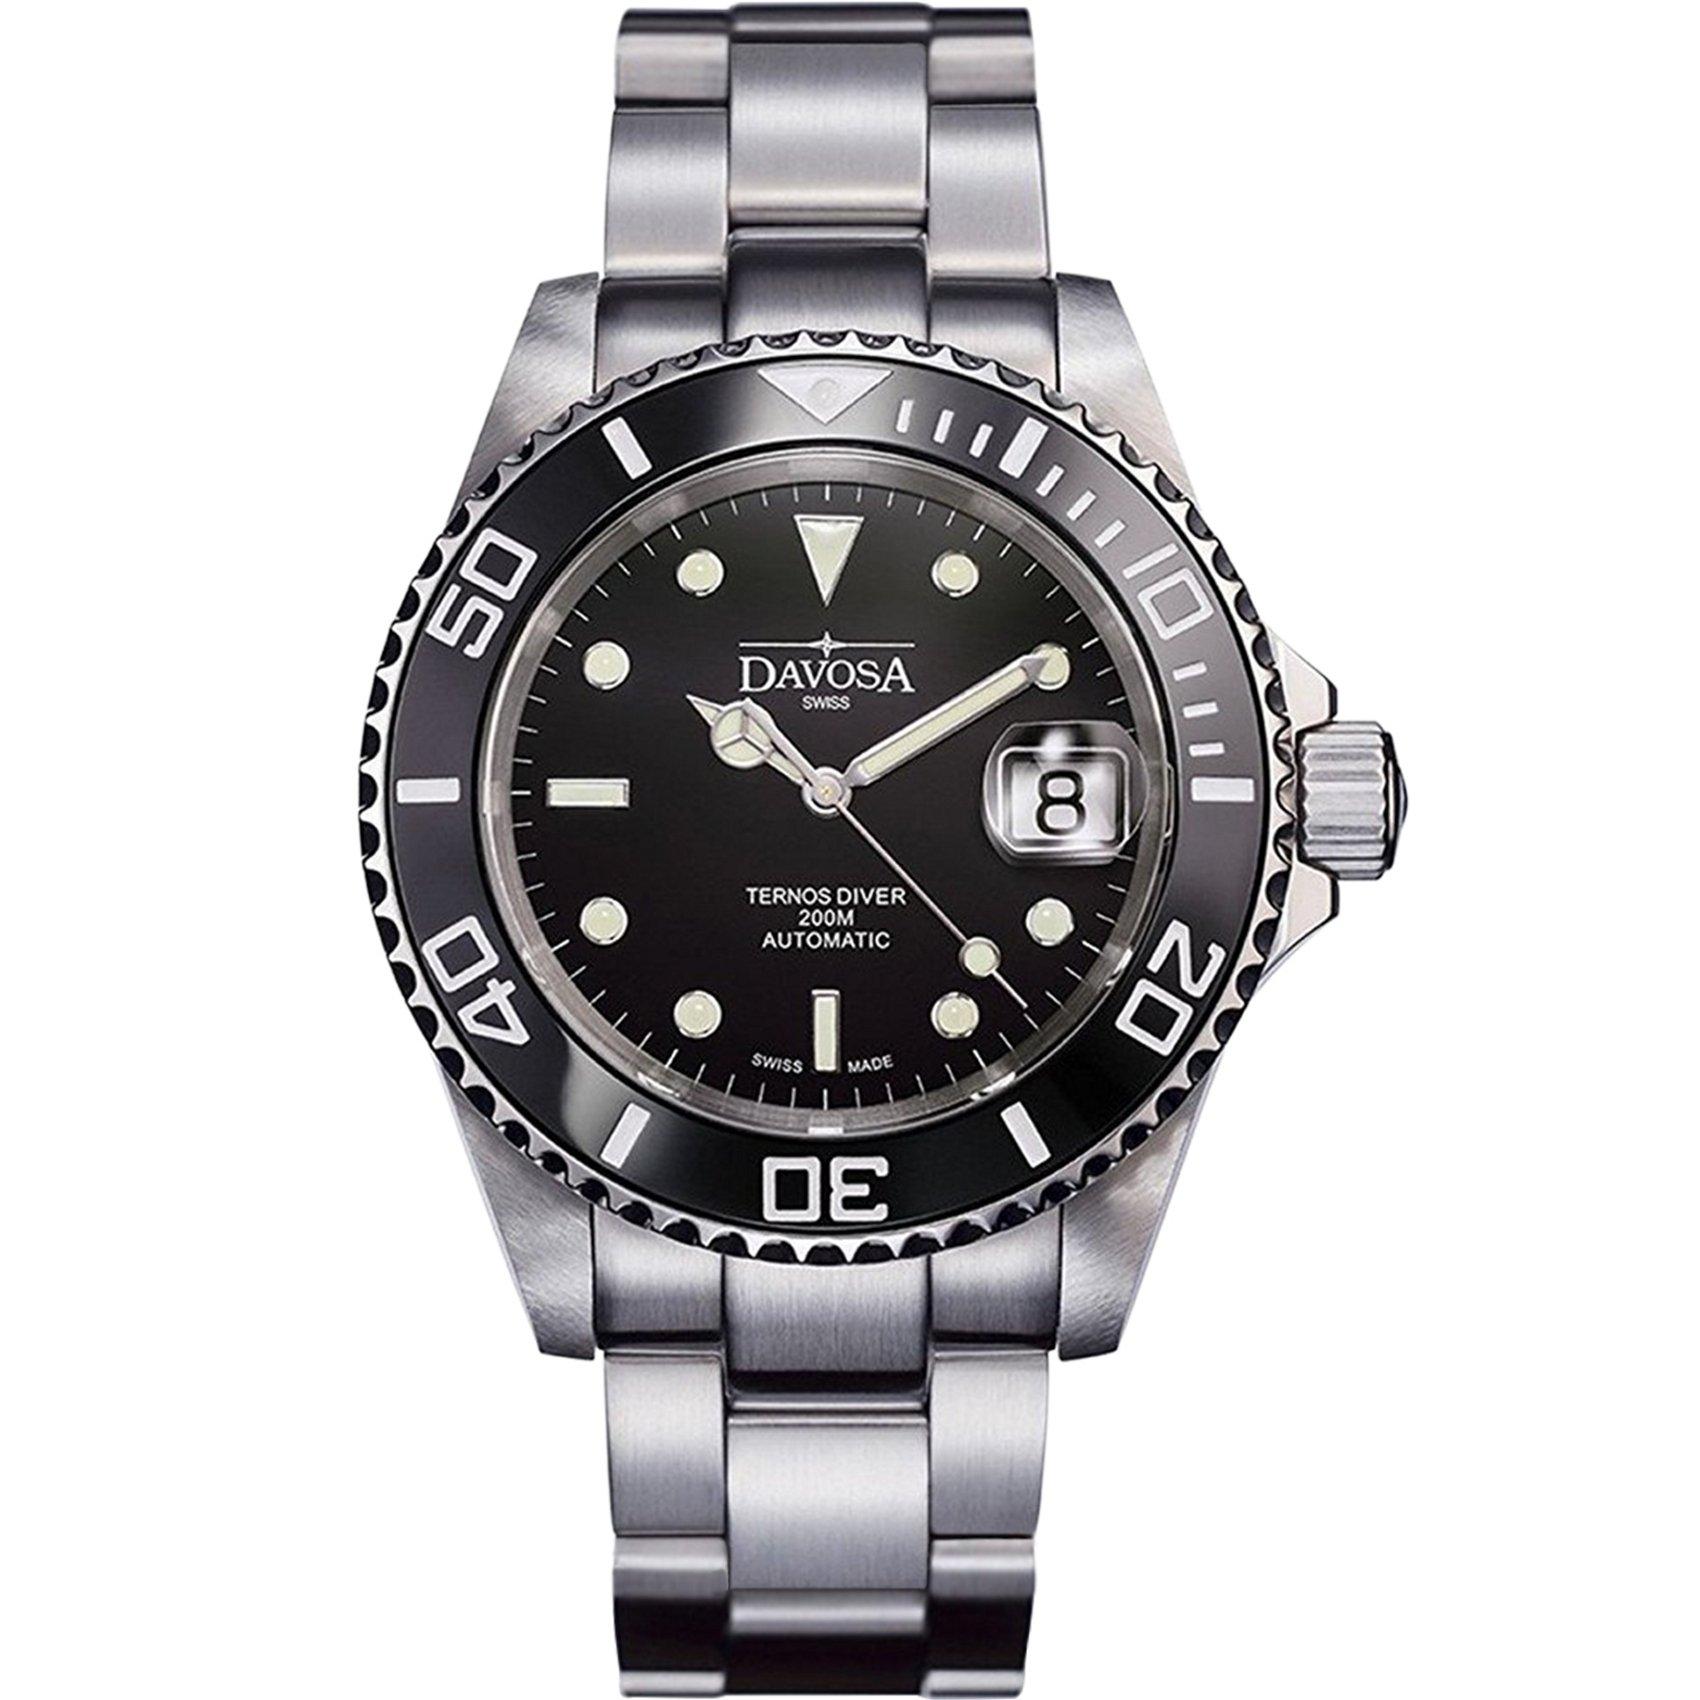 Davosa Swiss Made Men Wrist Watch, Ternos Ceramic 16155550 Professional Automatic Analog Display & Luxury Bezel by Davosa (Image #1)